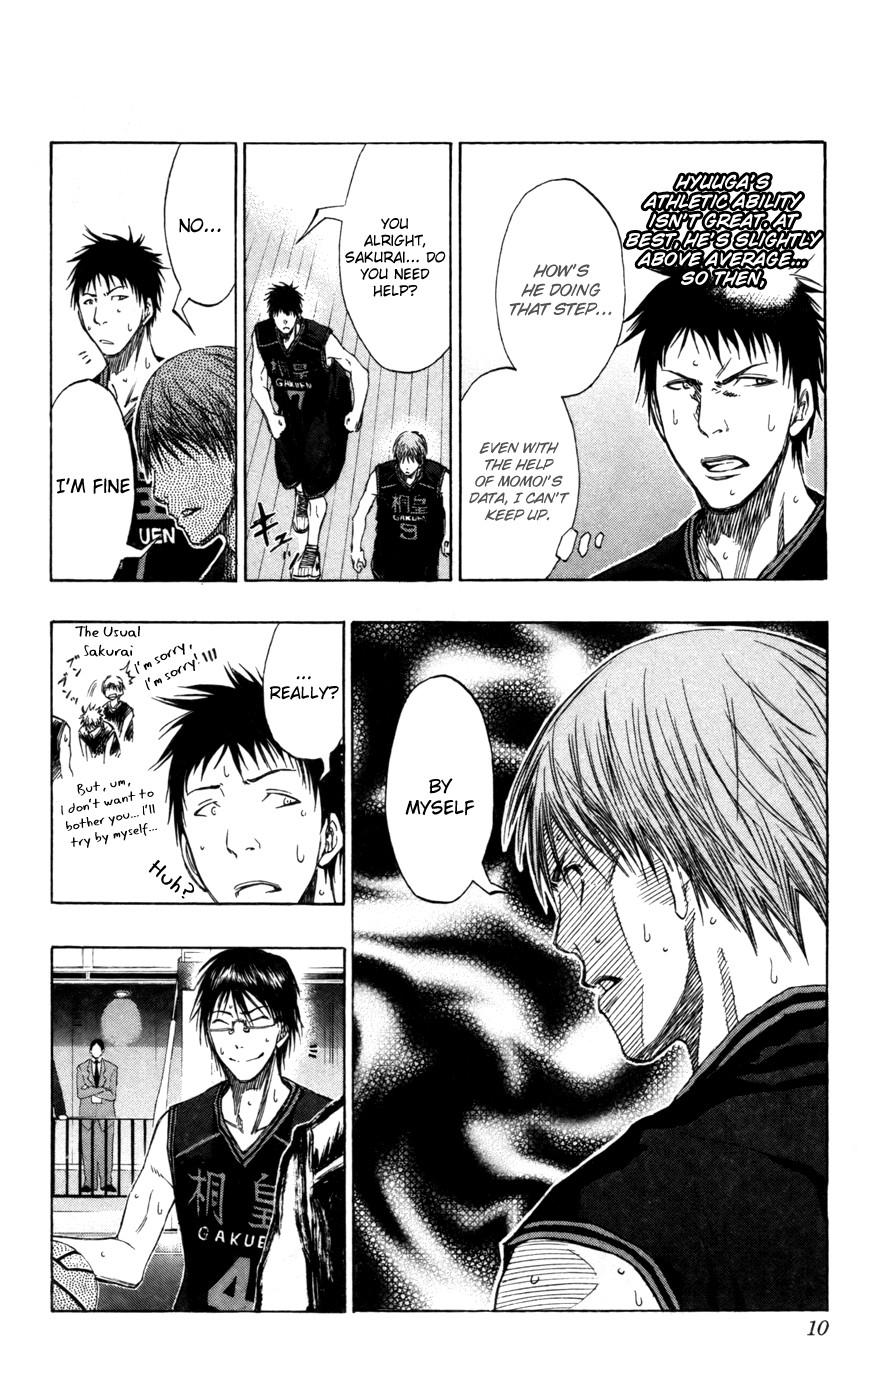 Kuroko no Basket Manga Chapter 118 - Image 4_010